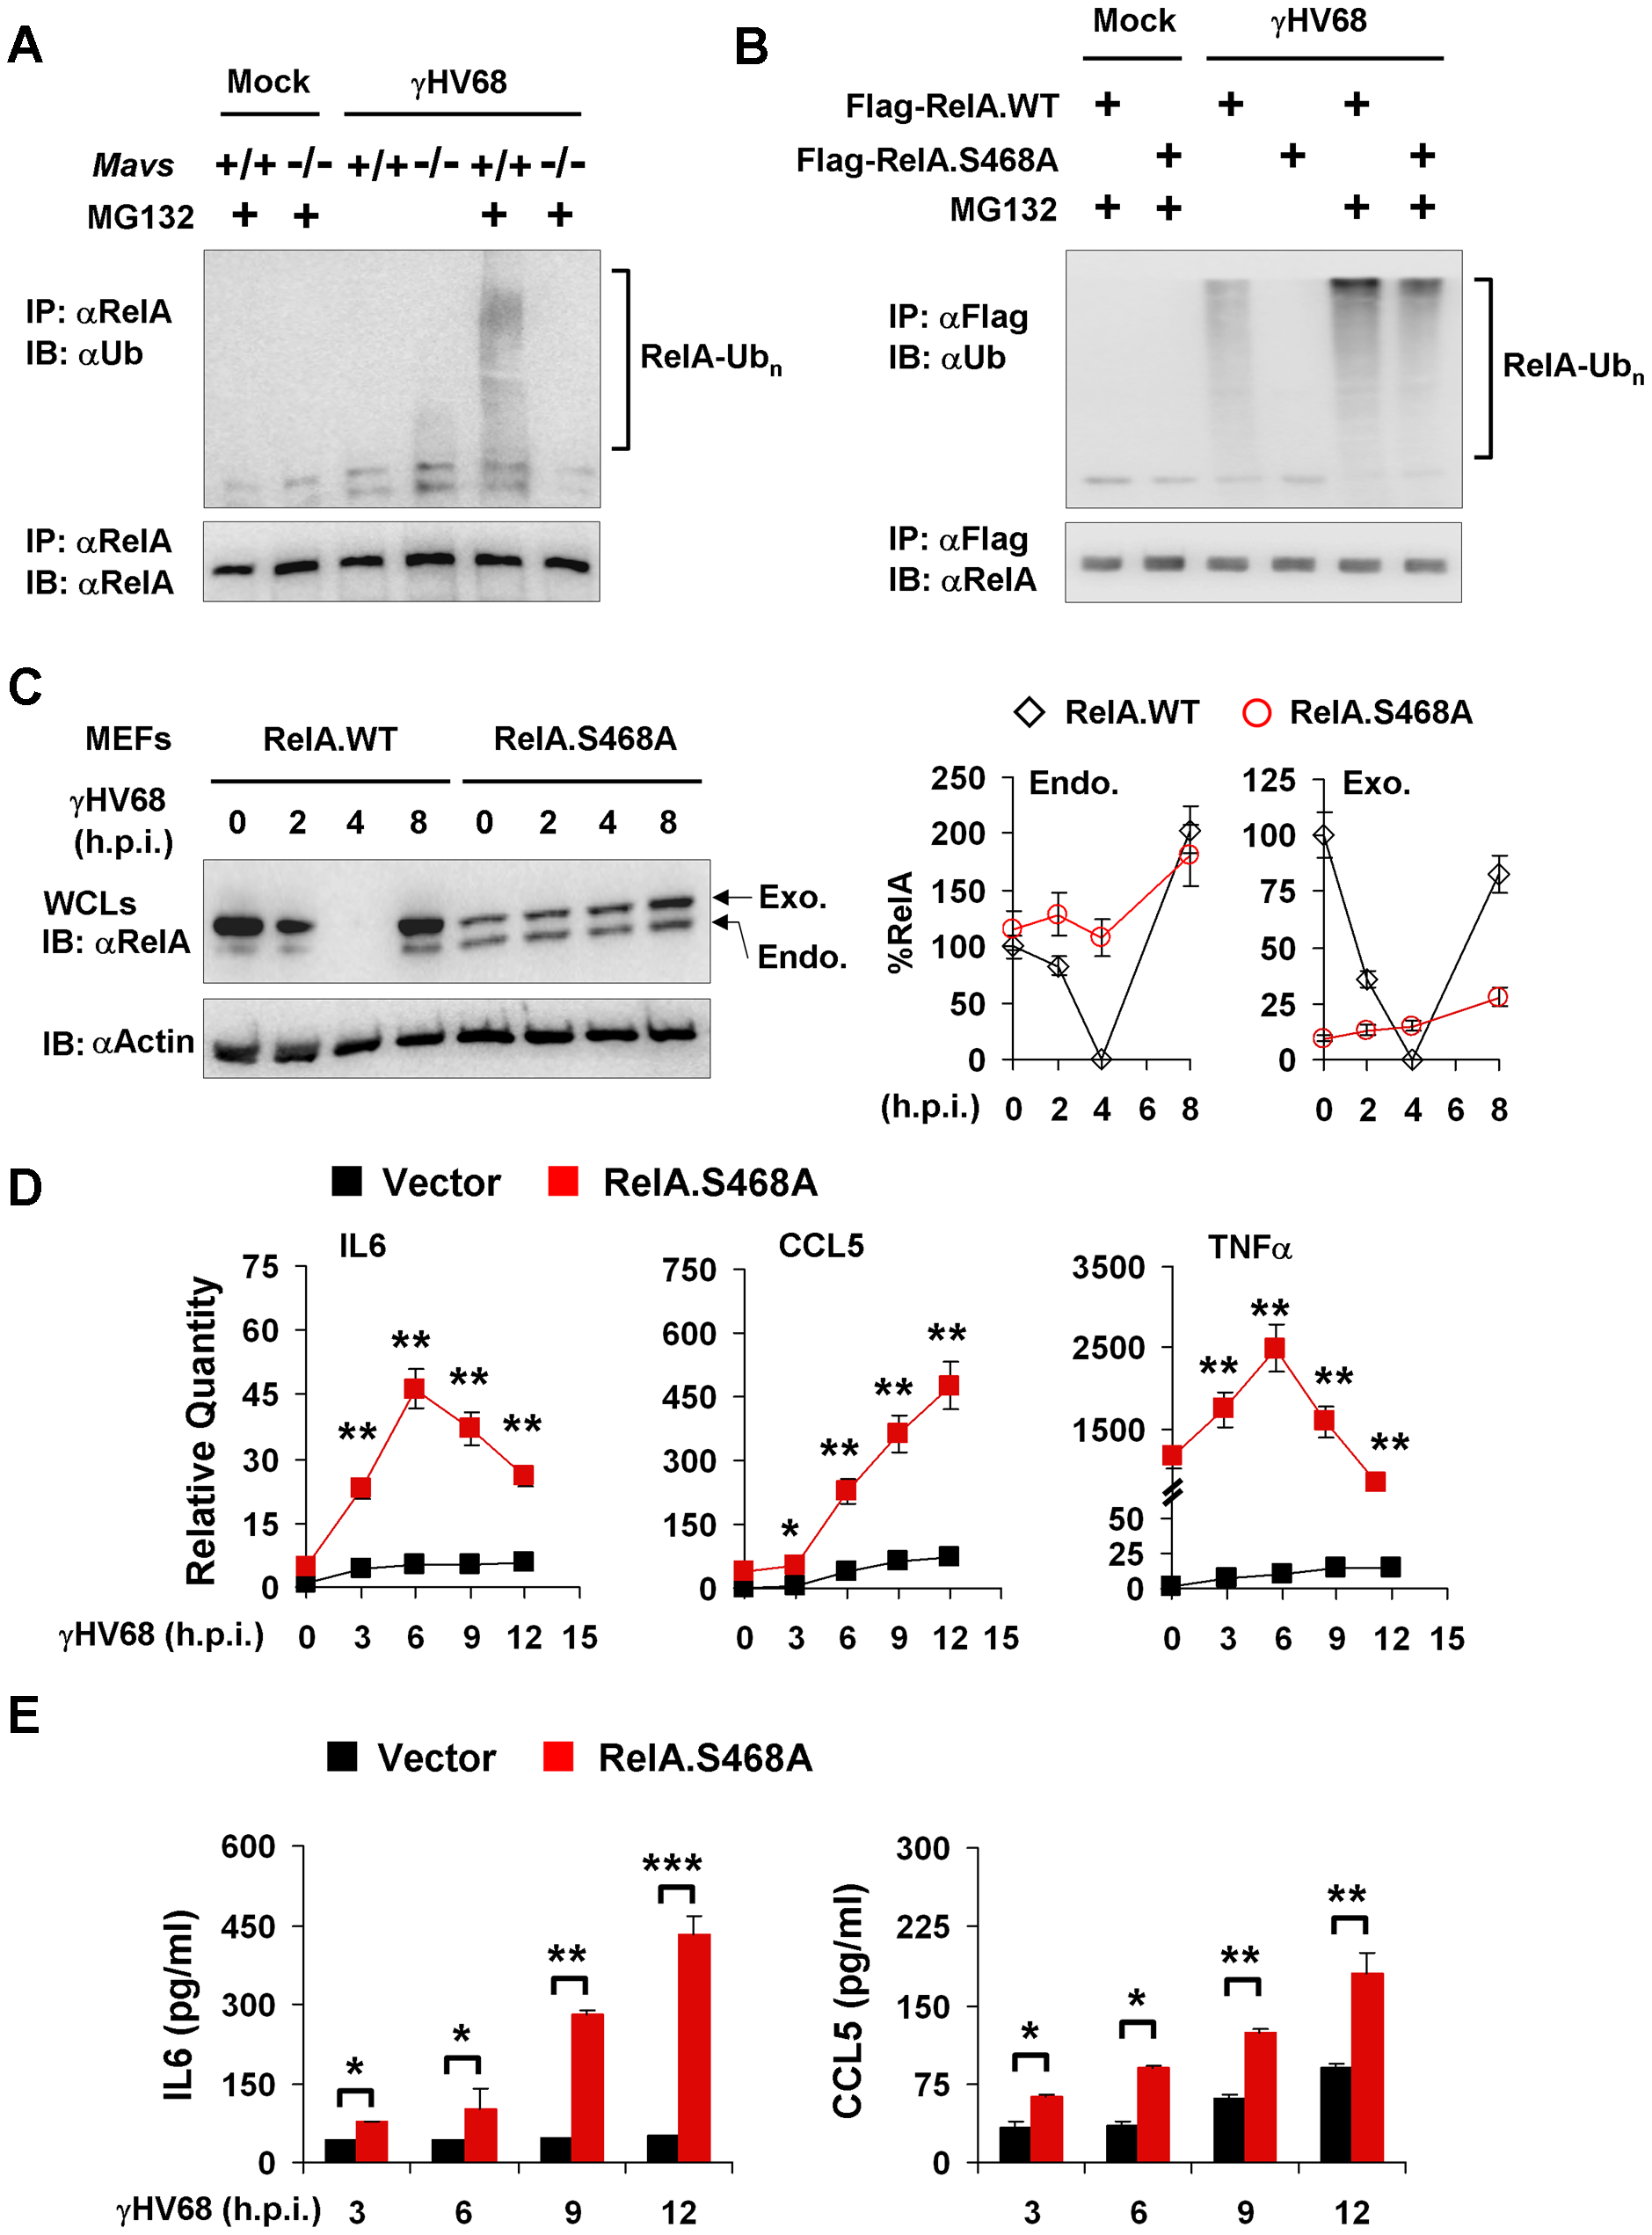 RelA phosphorylation at Serine 468 is critical for γHV68-induced RelA degradation.